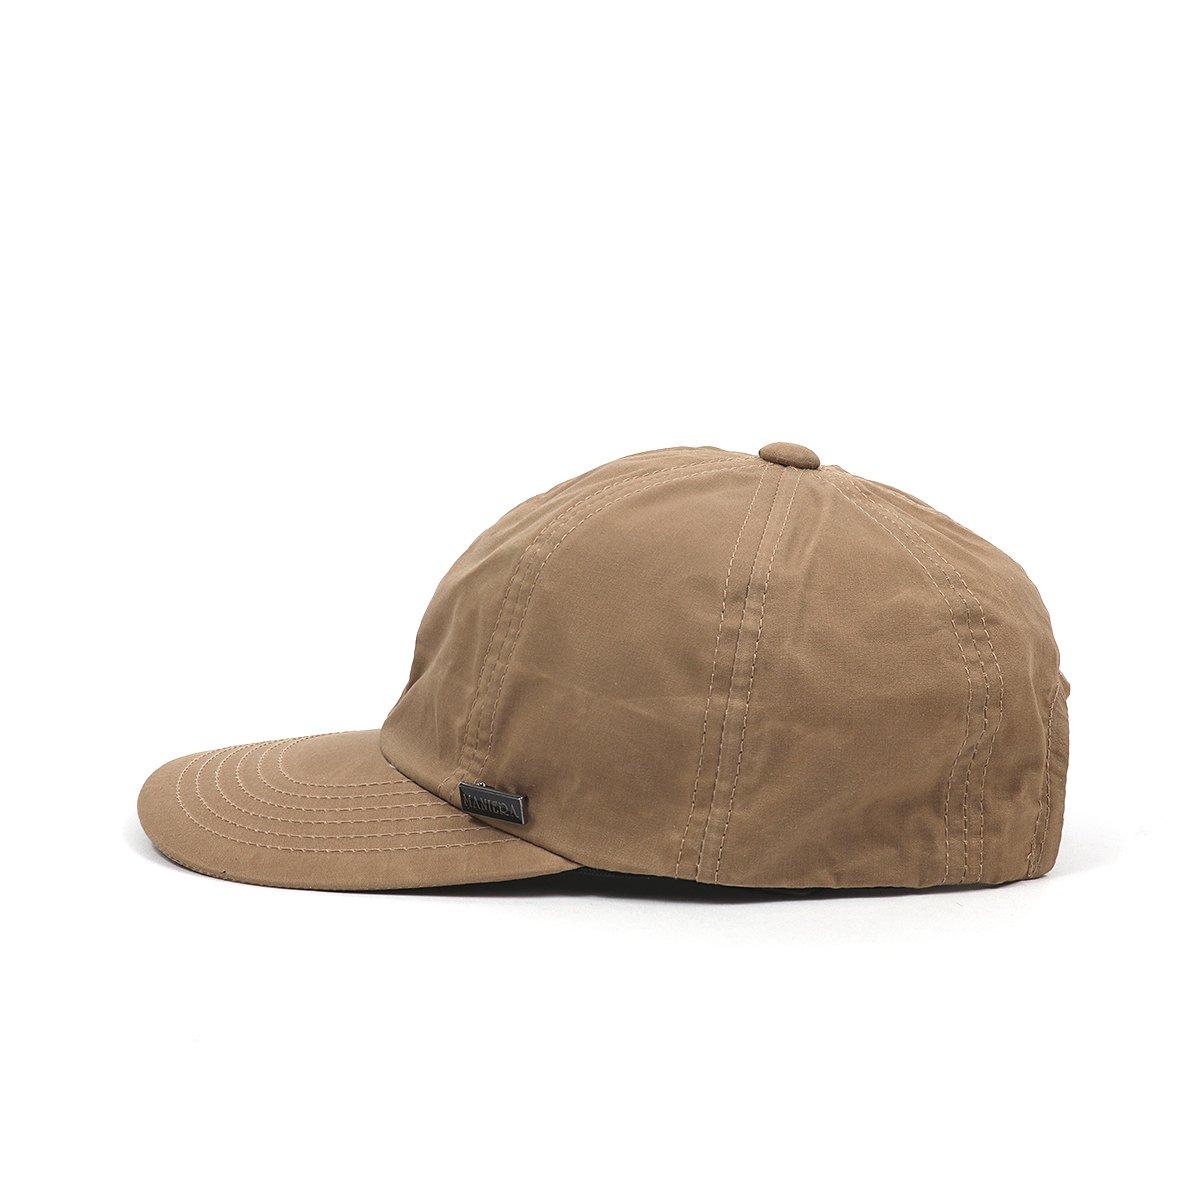 PRAFFIN CAP 詳細画像1